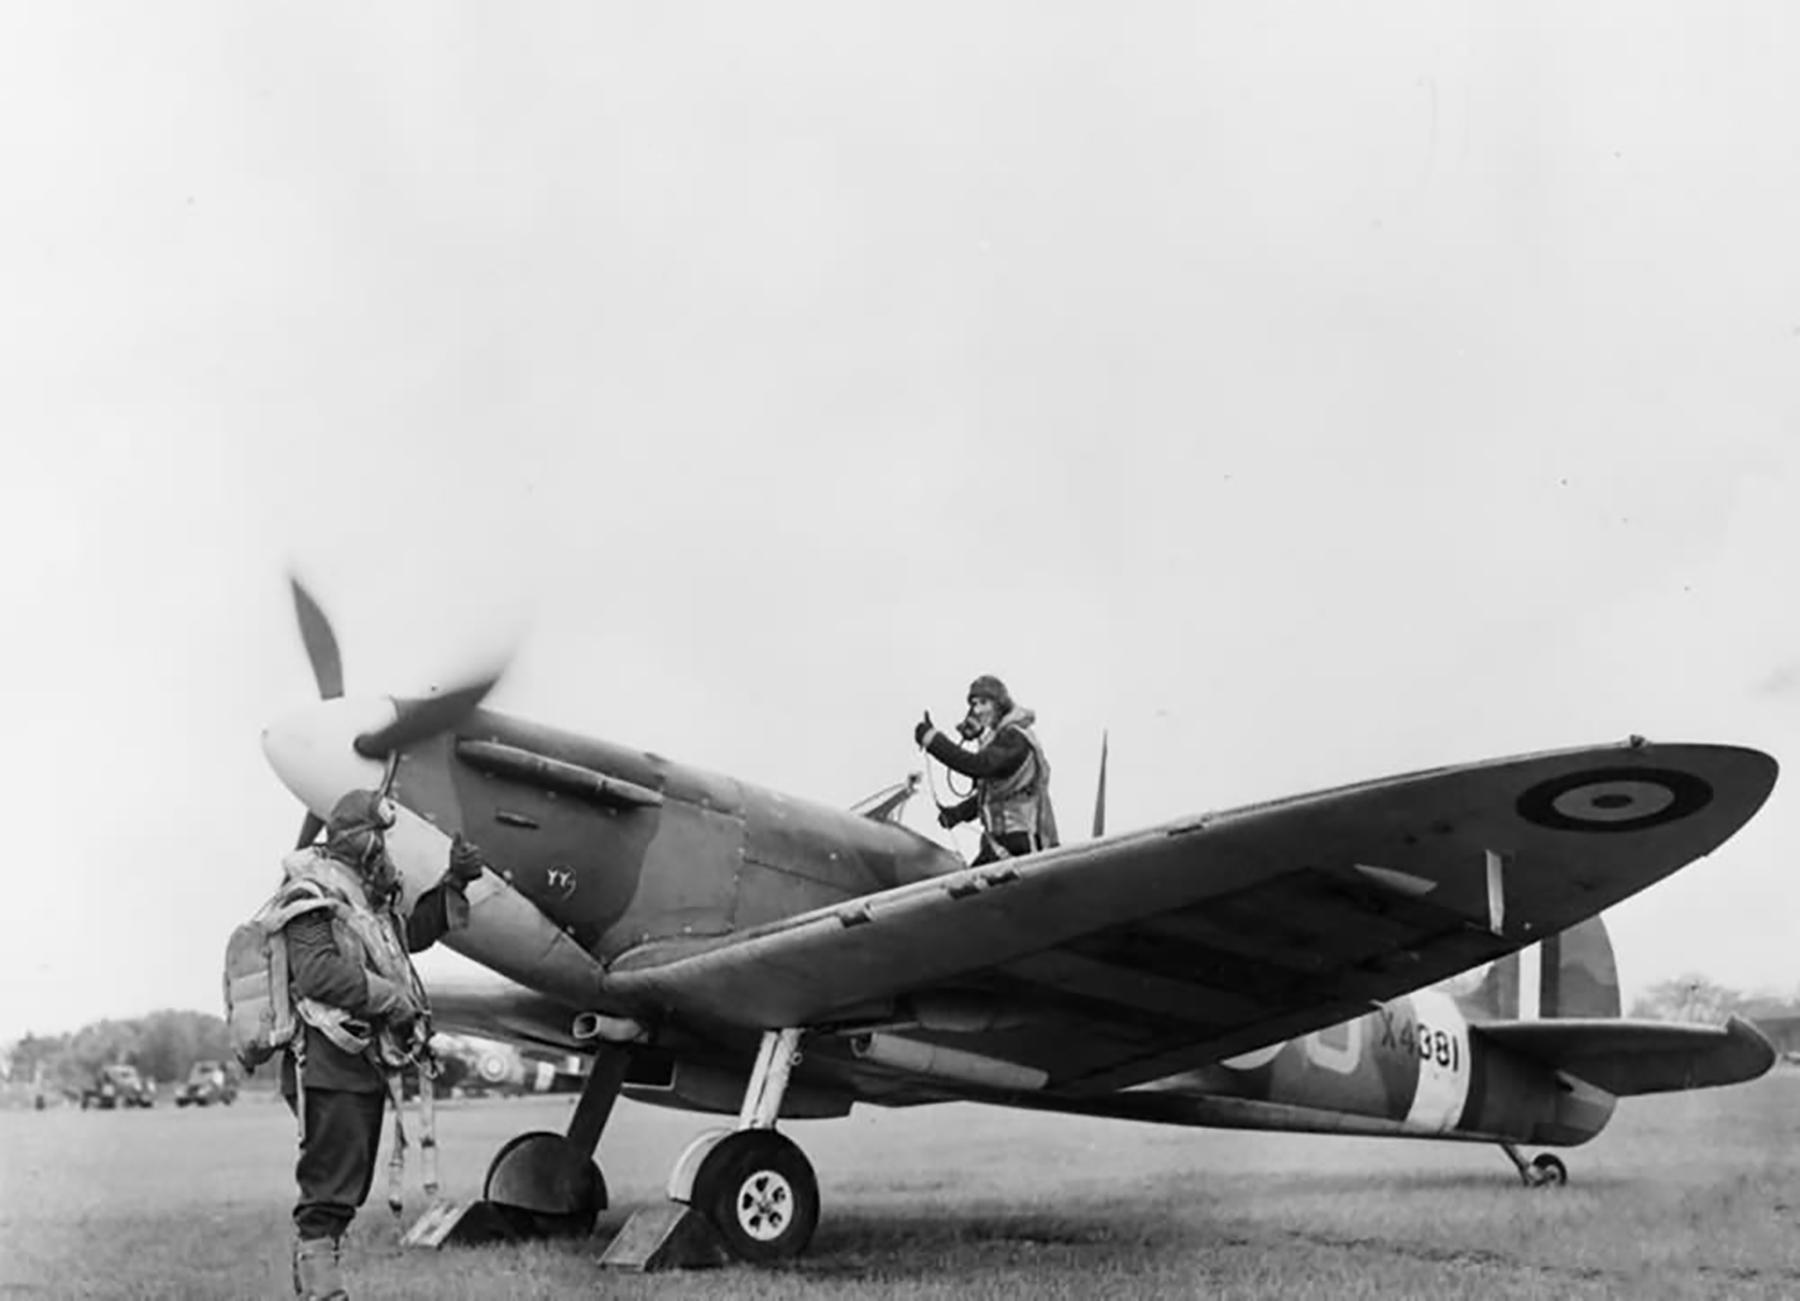 Spitfire MkIa RAF 501Sqn SDJ X4381 at Colerne web 01